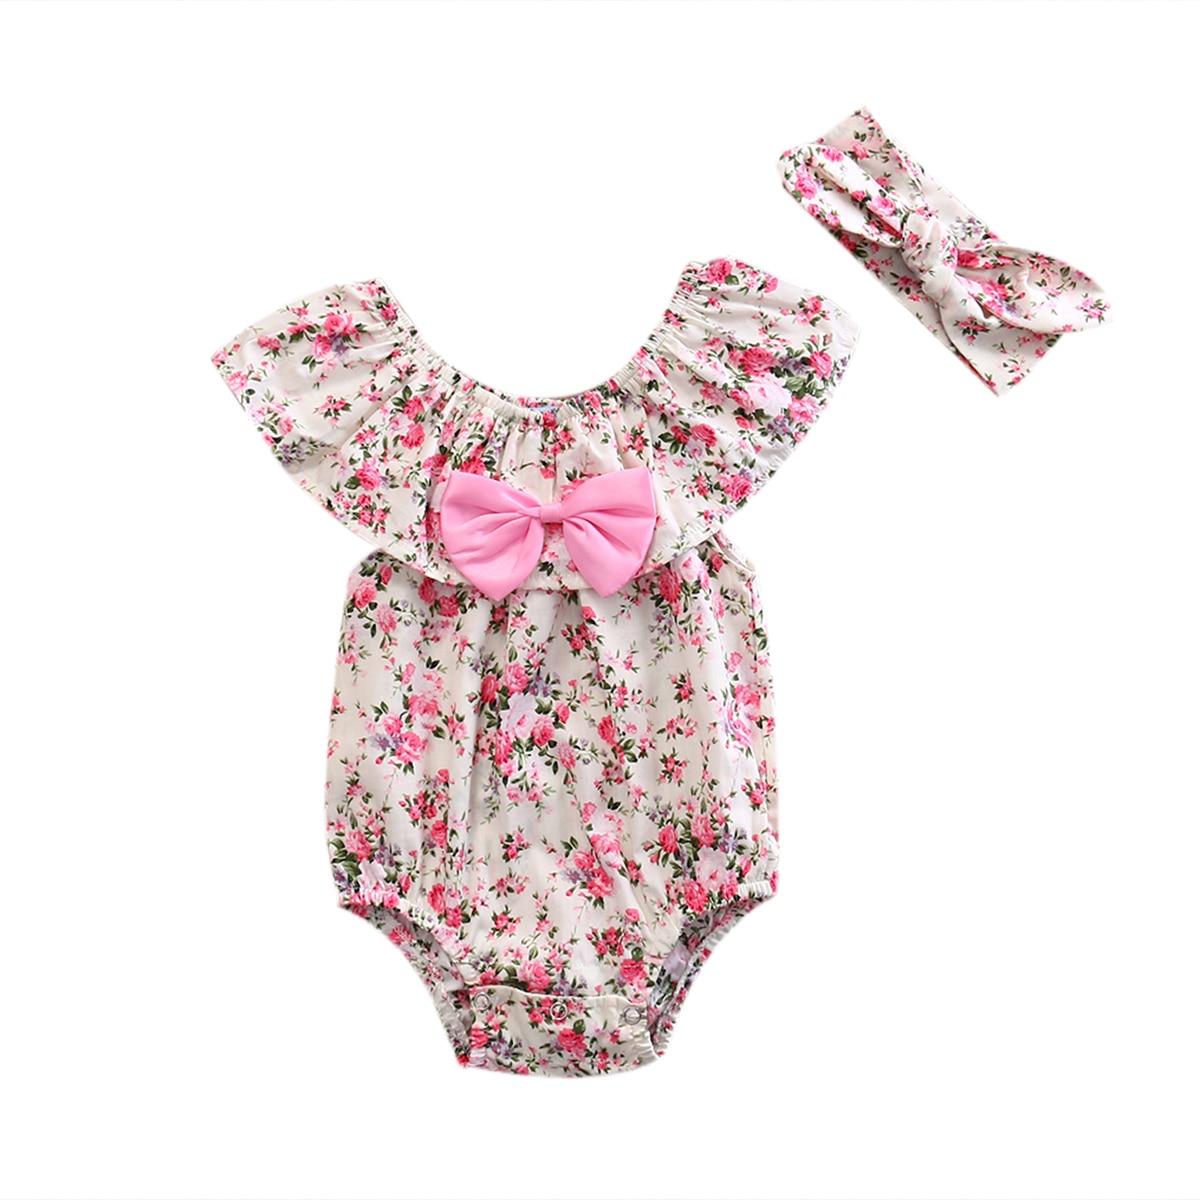 2017 New Hot Newborn Baby Girls Romper Lace Floral Romper Ruffle Jumpsuit Playsuit Clothes One Piece Suit Beach Dress